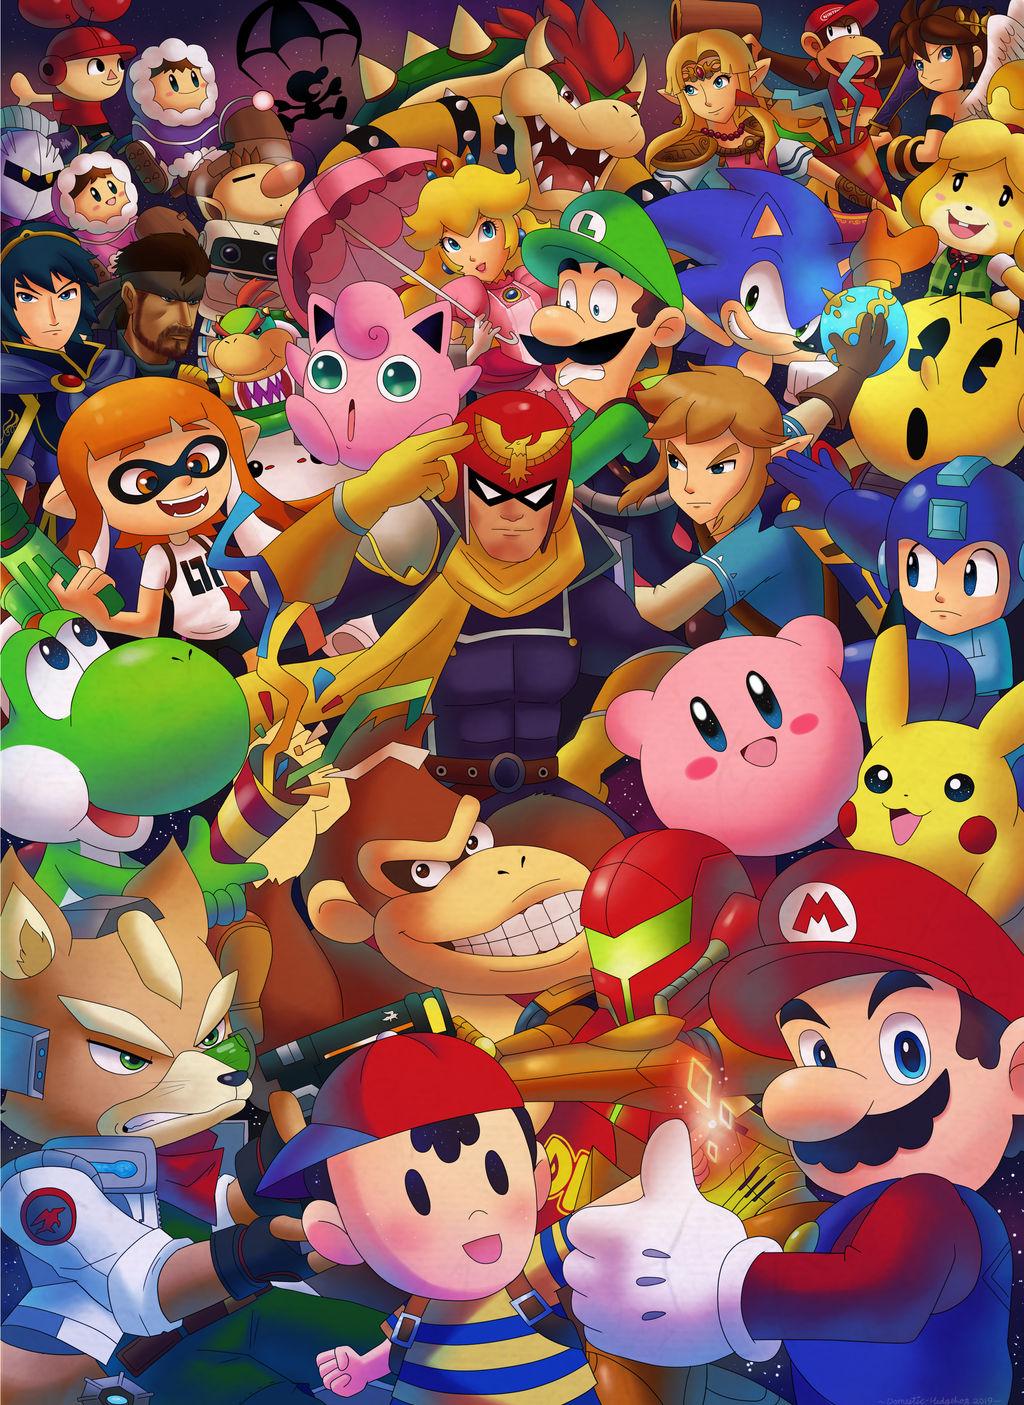 Smash Bros Ultimate Happy New Year 2019